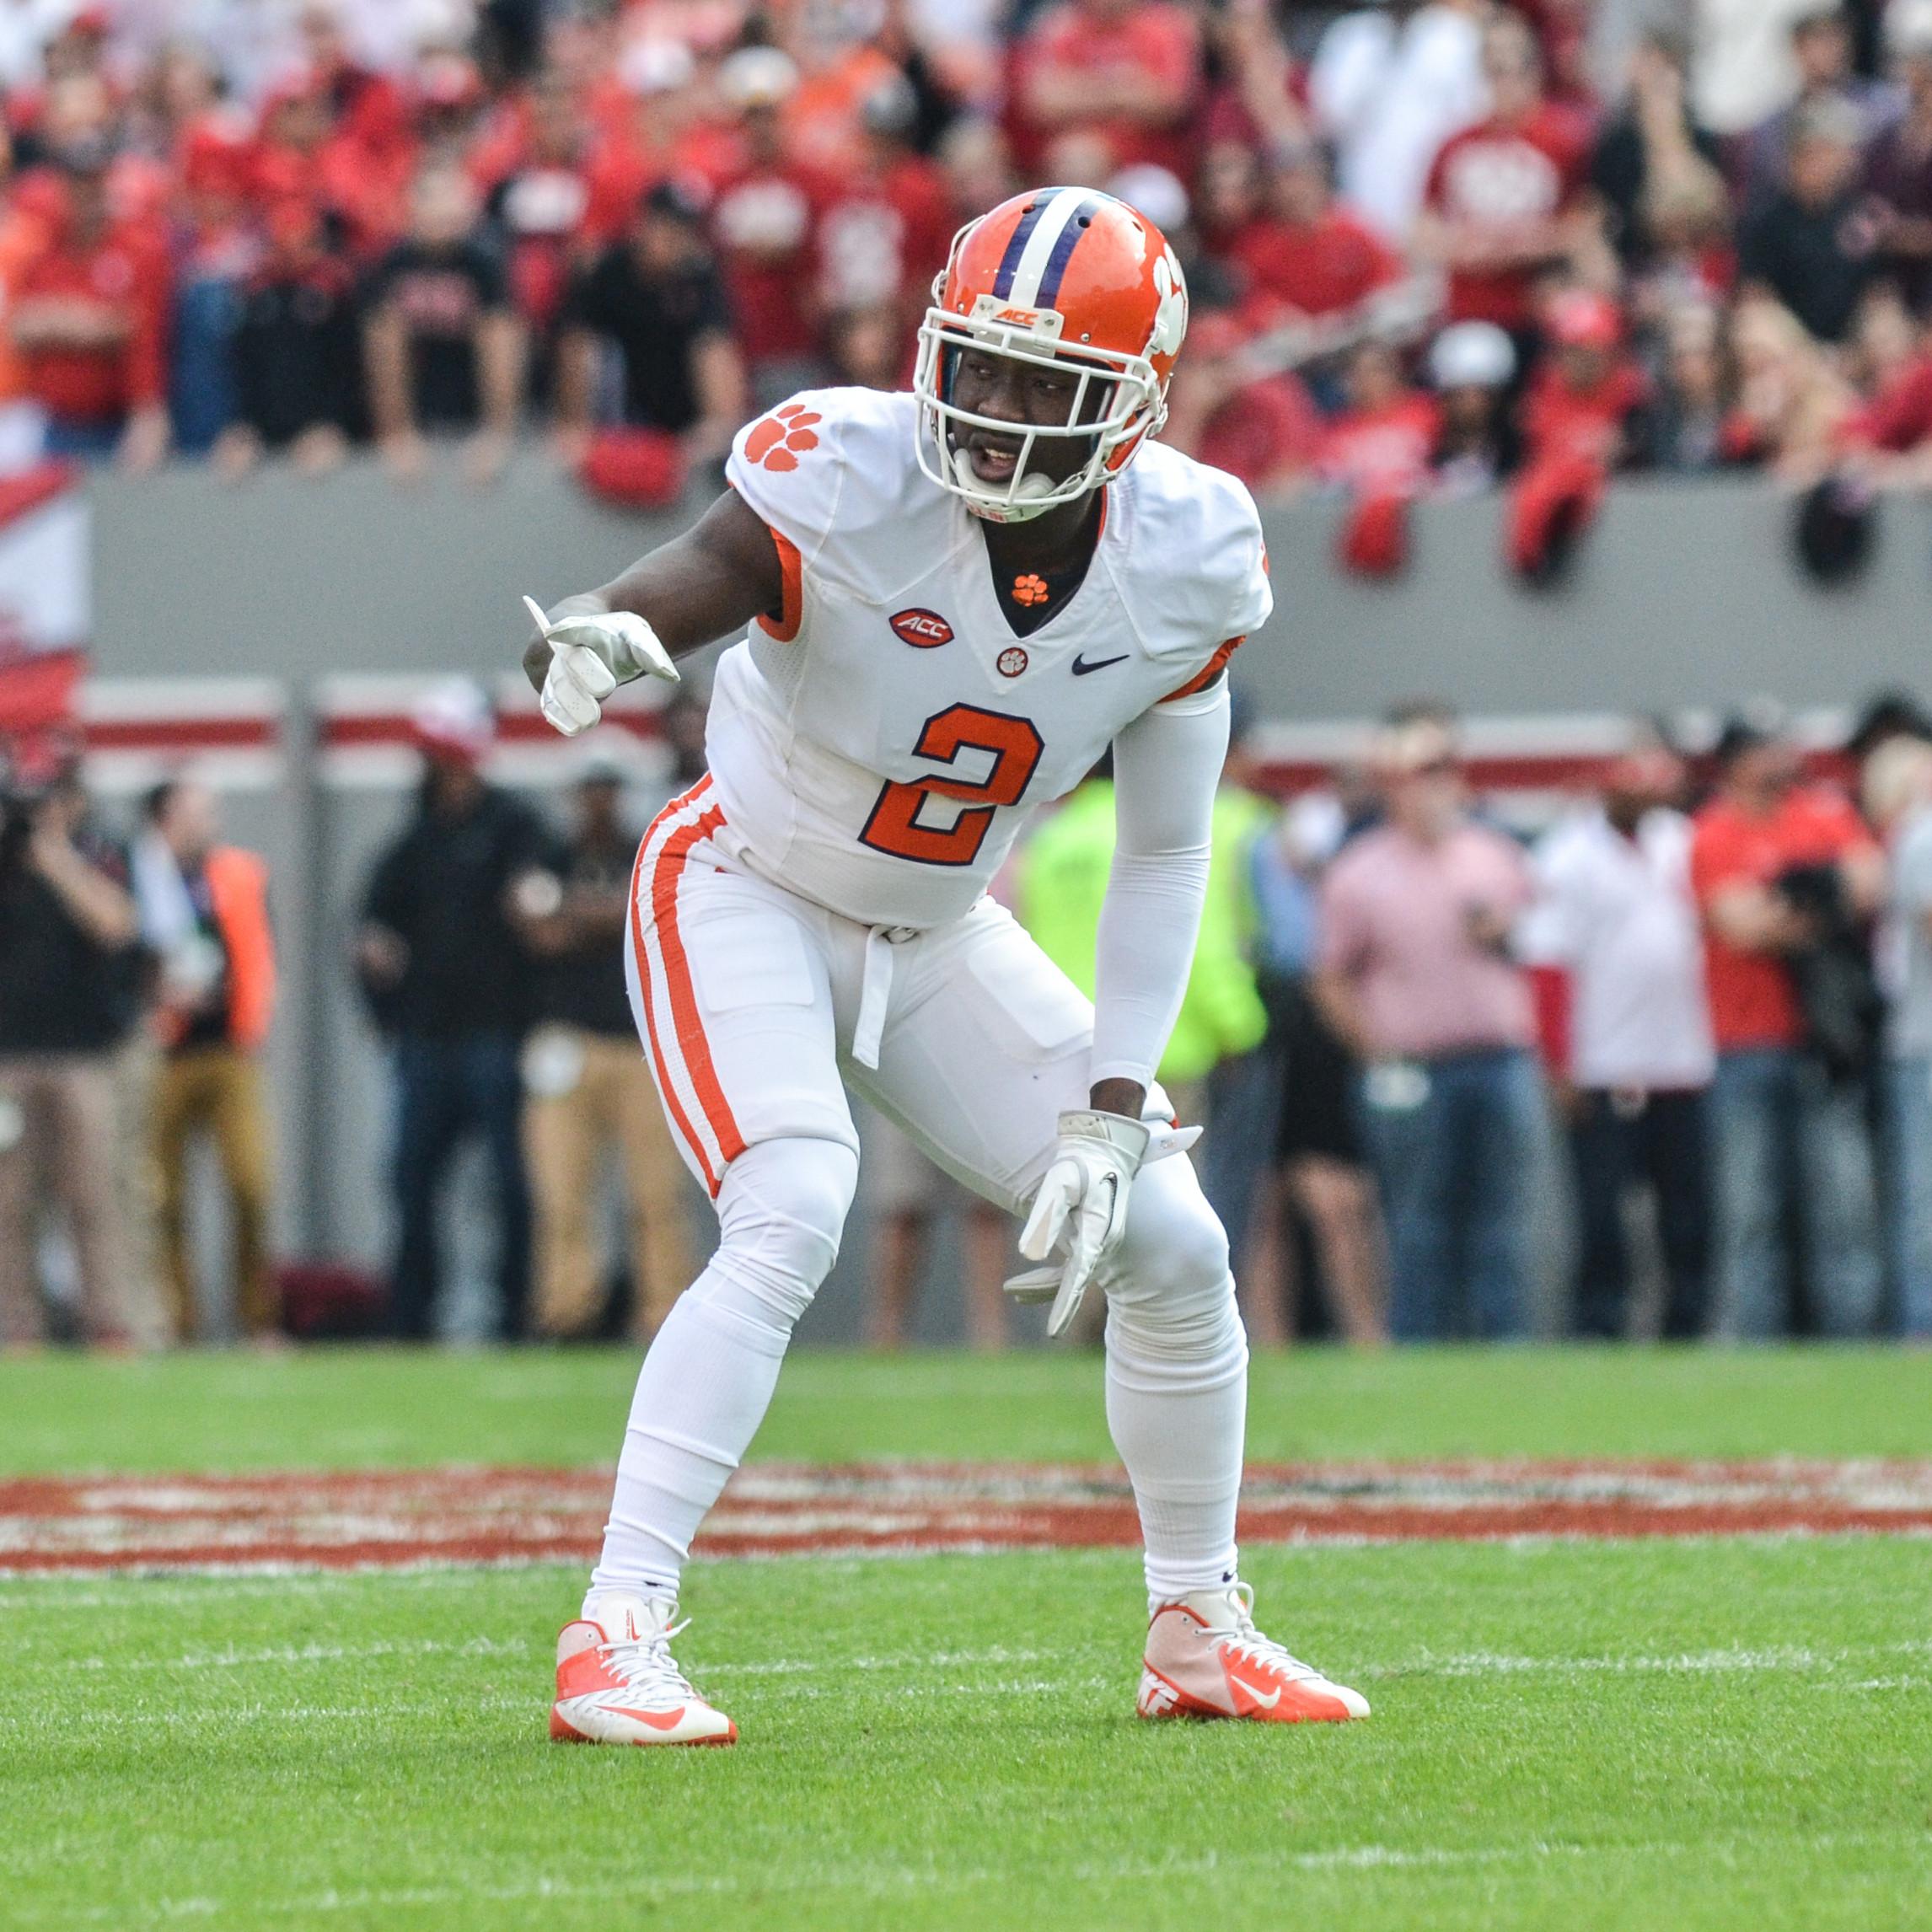 Draft Watch: Mackensie Alexander